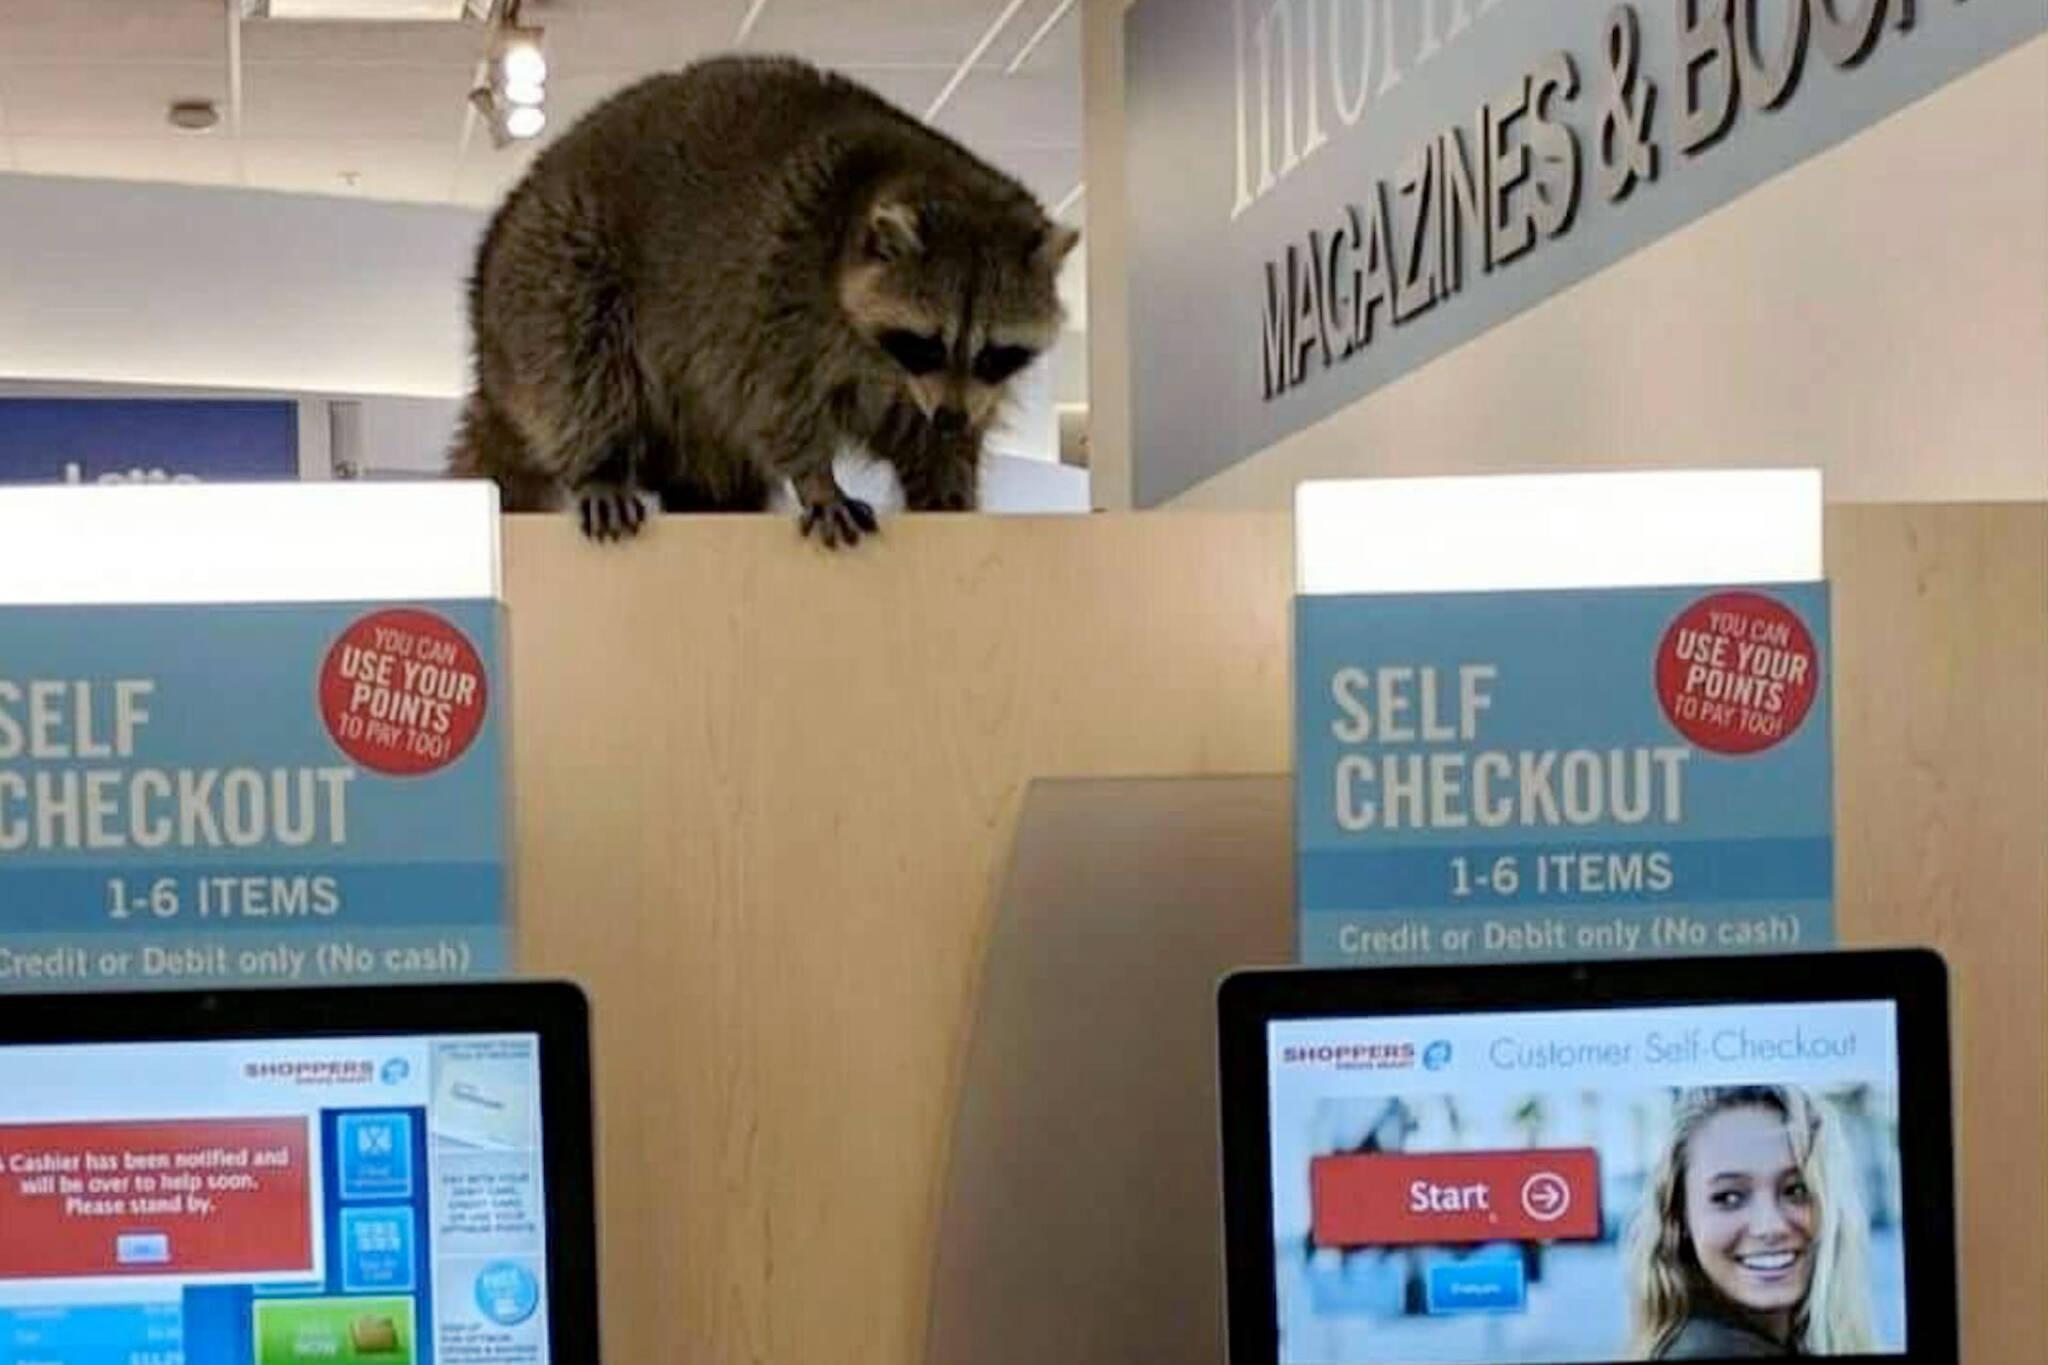 Toronto Raccoon Shoppers